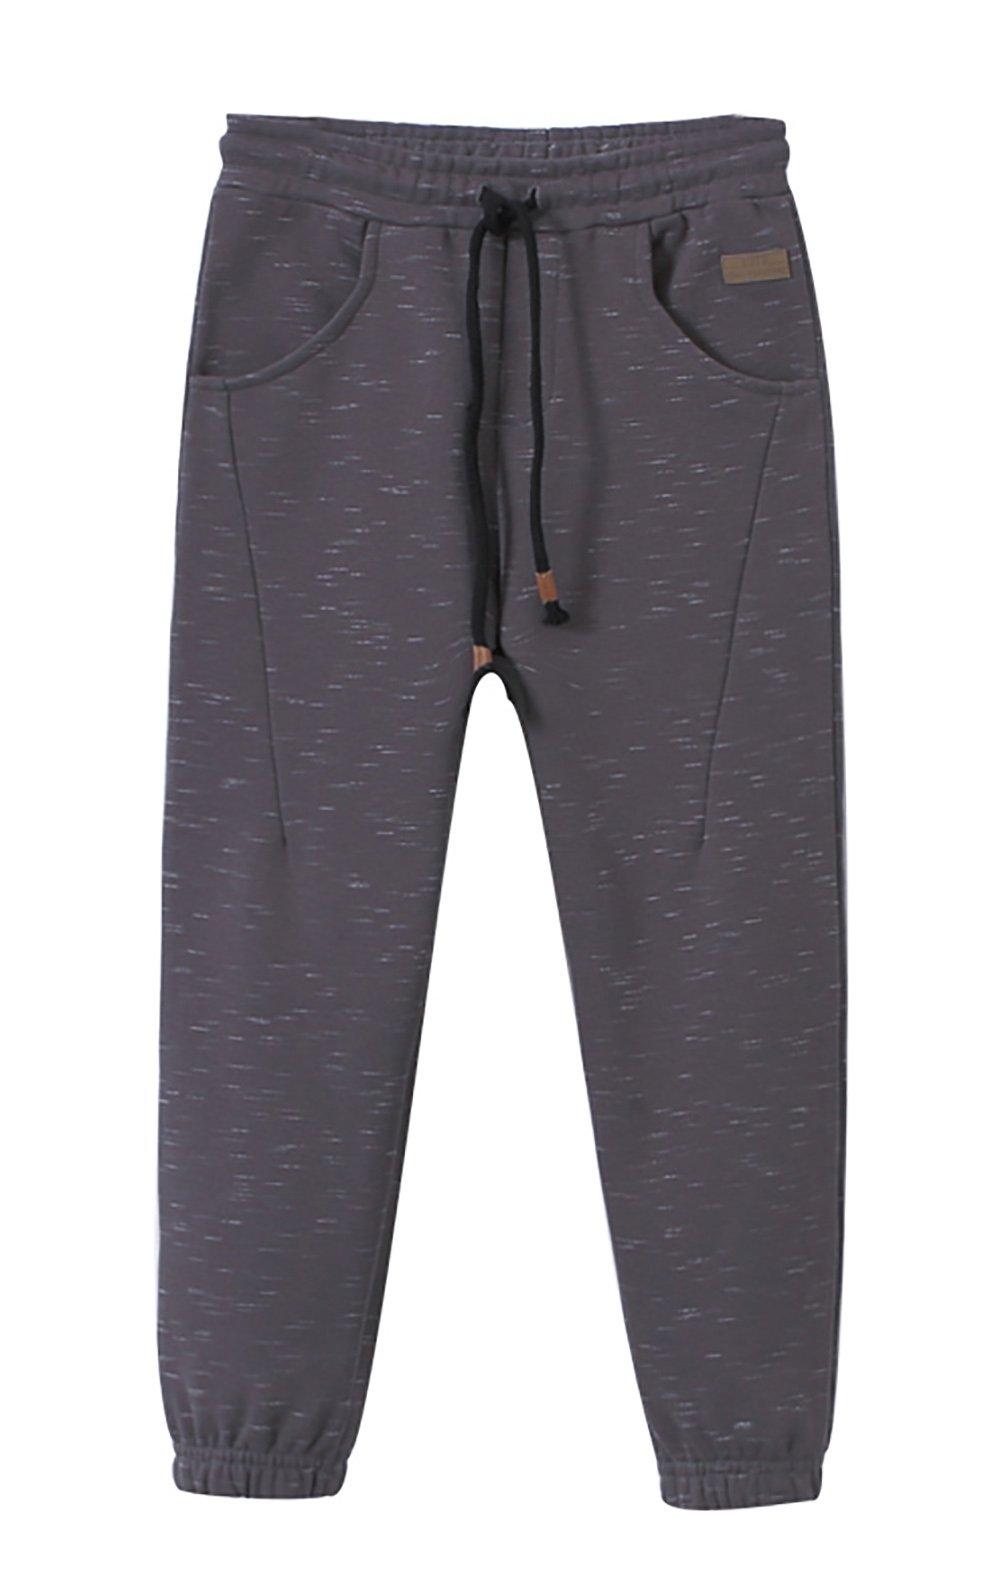 Zegoo Boys' Open-Bottom Sweatpants Joggers Grey 4T 5T